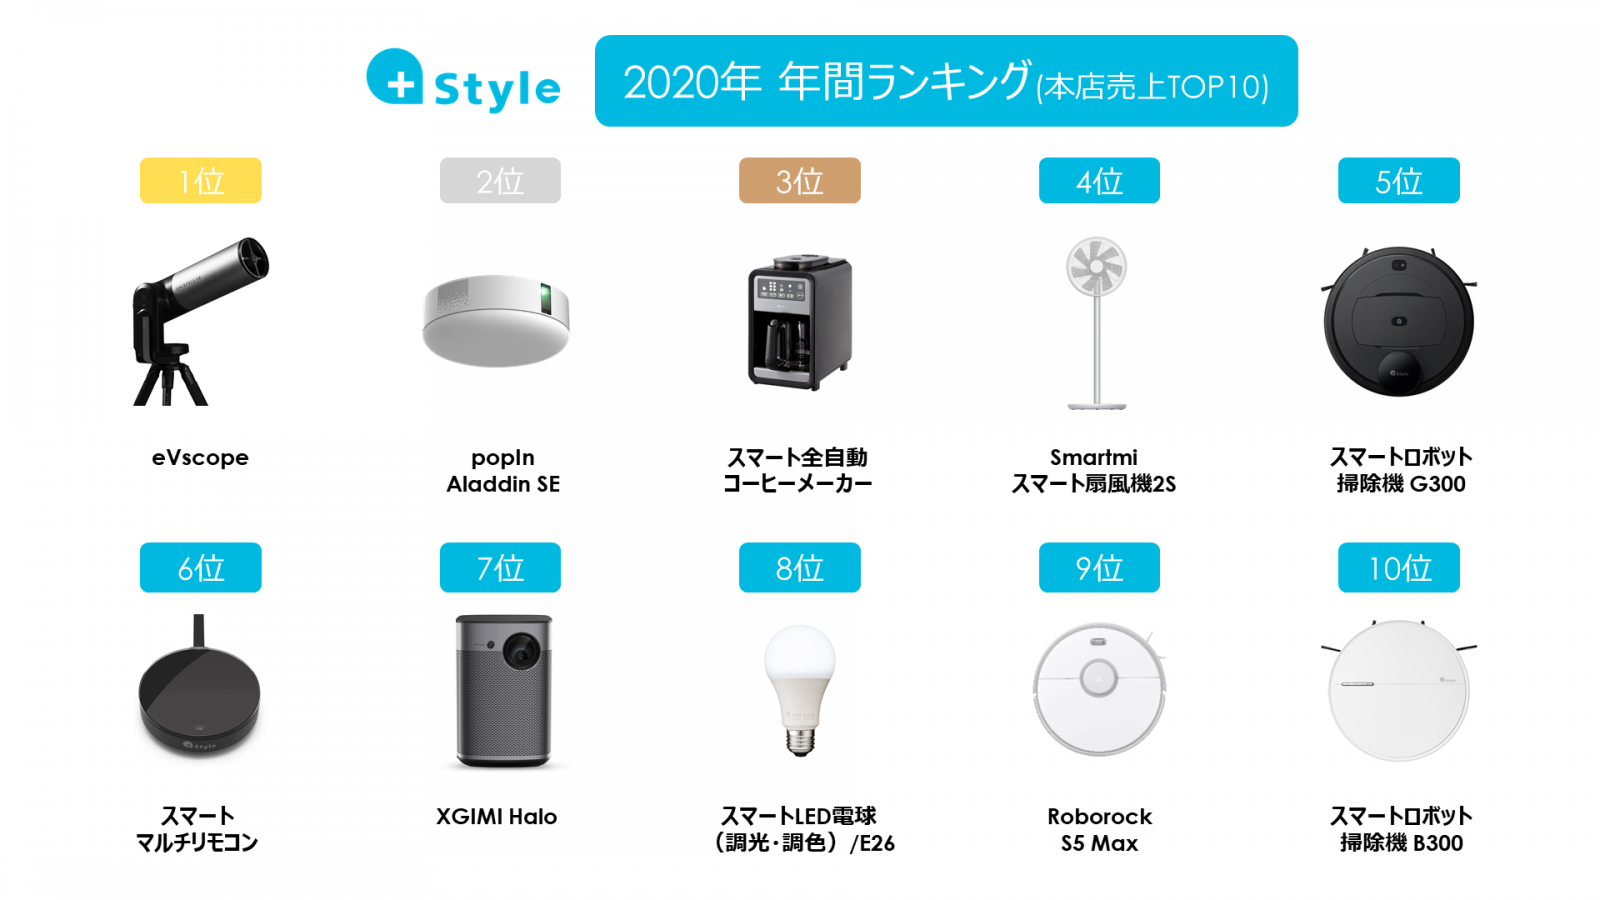 Style 人気IoT製品 年間ランキング 2020 - 最先端のIoT製品とスマート ...